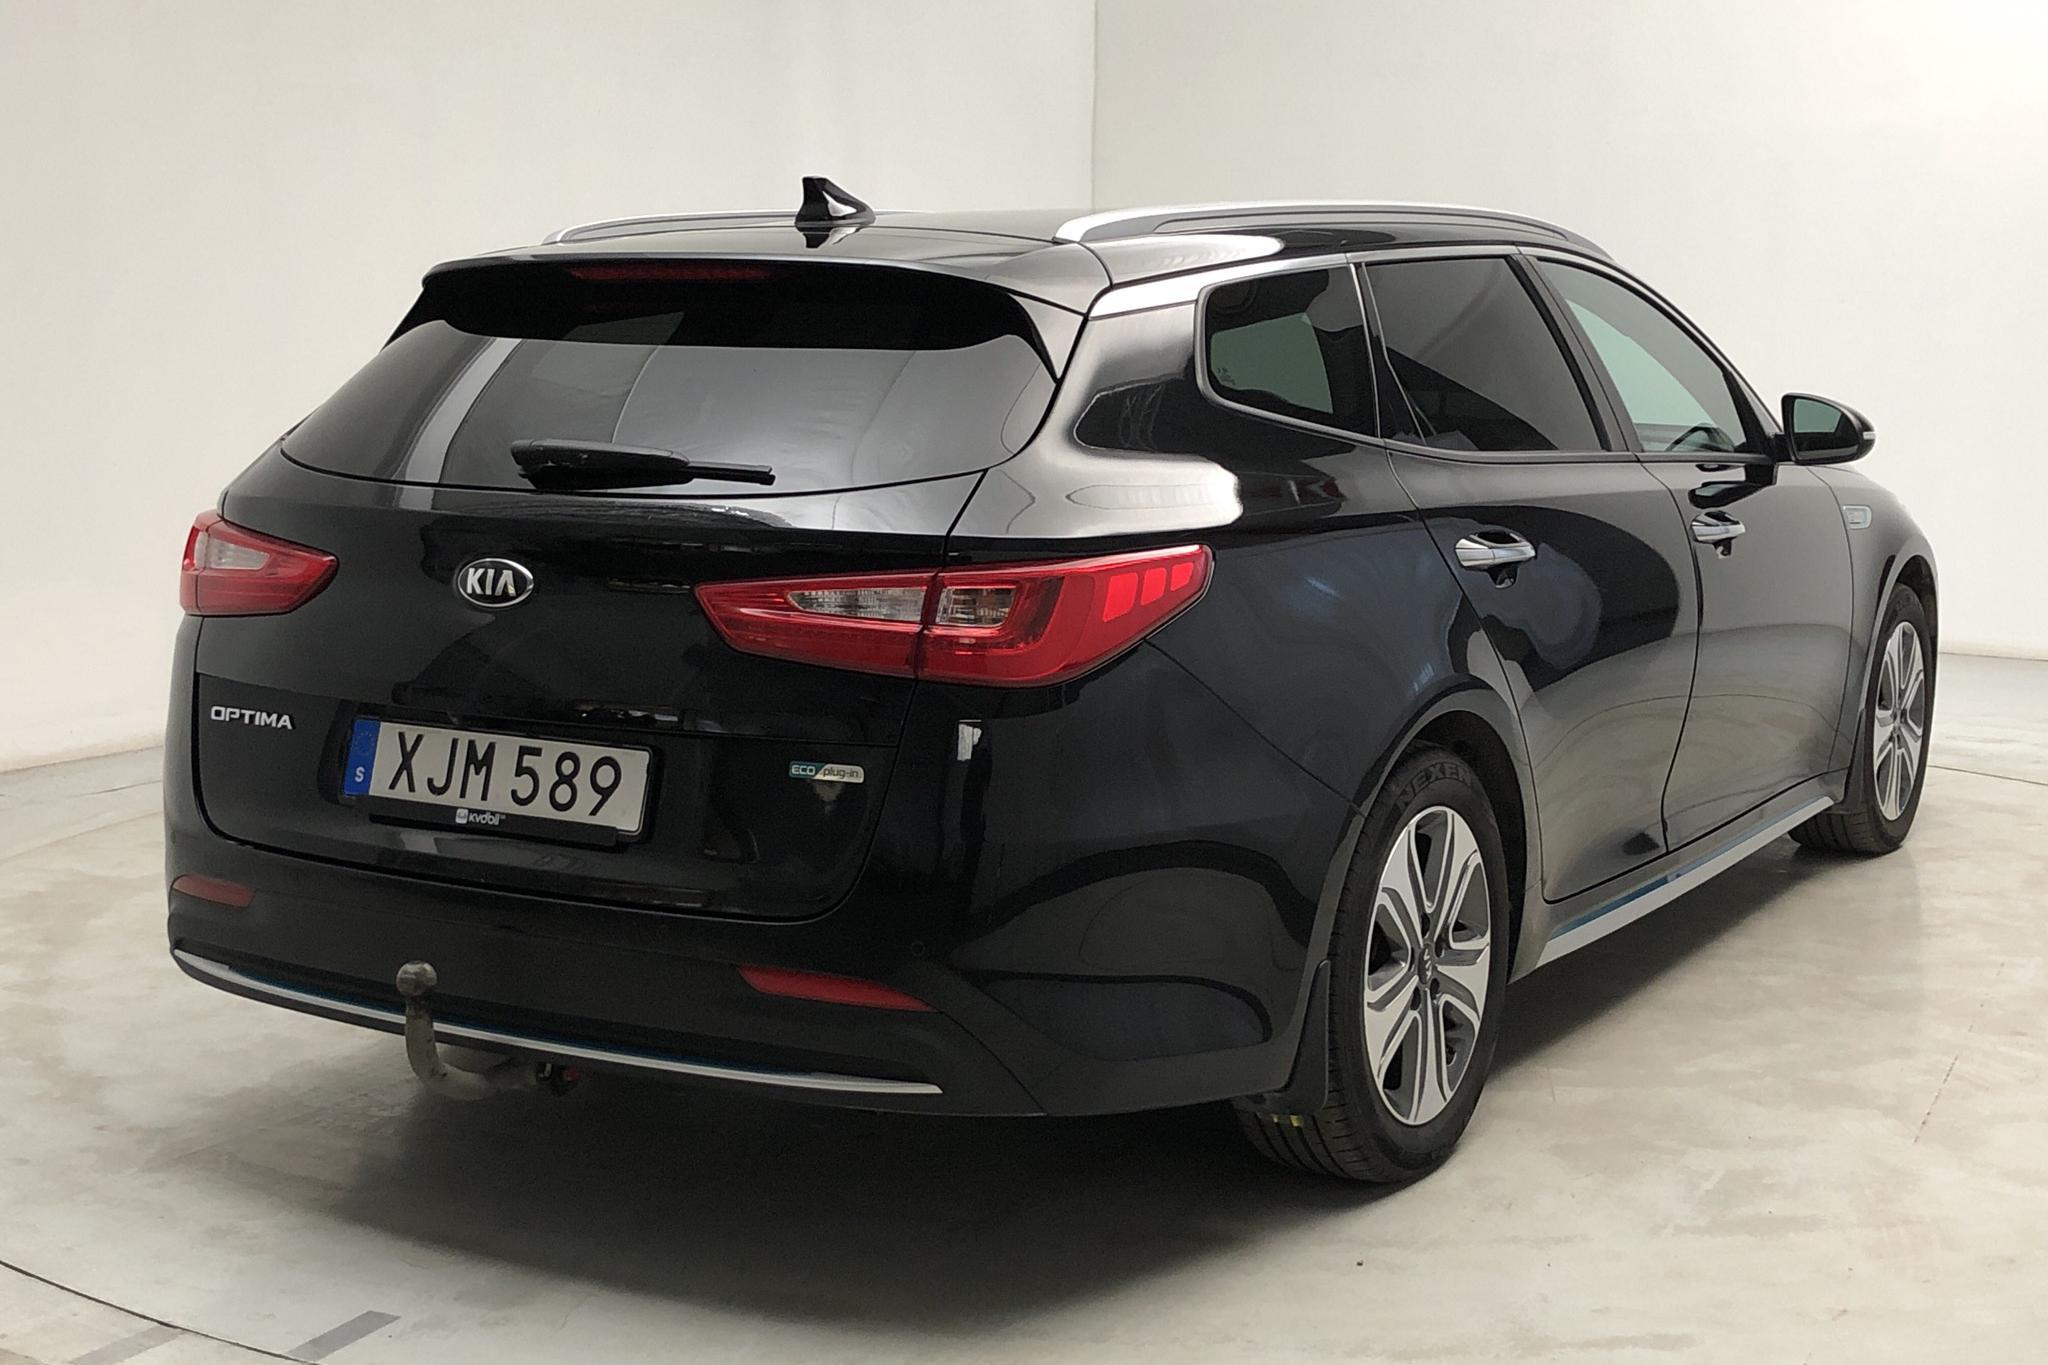 KIA Optima 2.0 GDi Plug-in Hybrid SW (205hk) - 118 810 km - Automatic - black - 2018